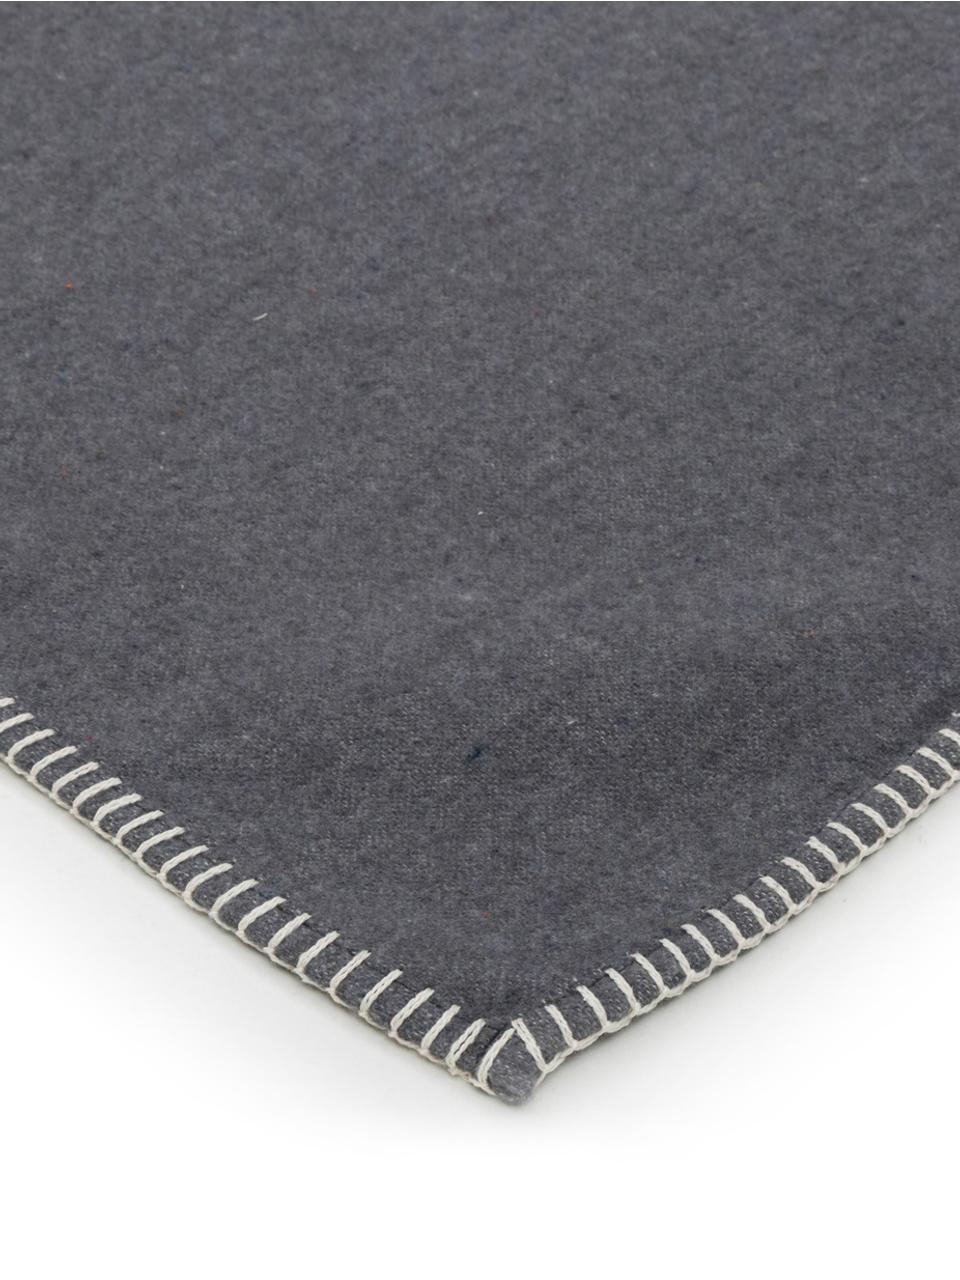 Kuscheldecke Sylt in Grau mit Steppnaht, Webart: Jacquard, Grau, 140 x 200 cm